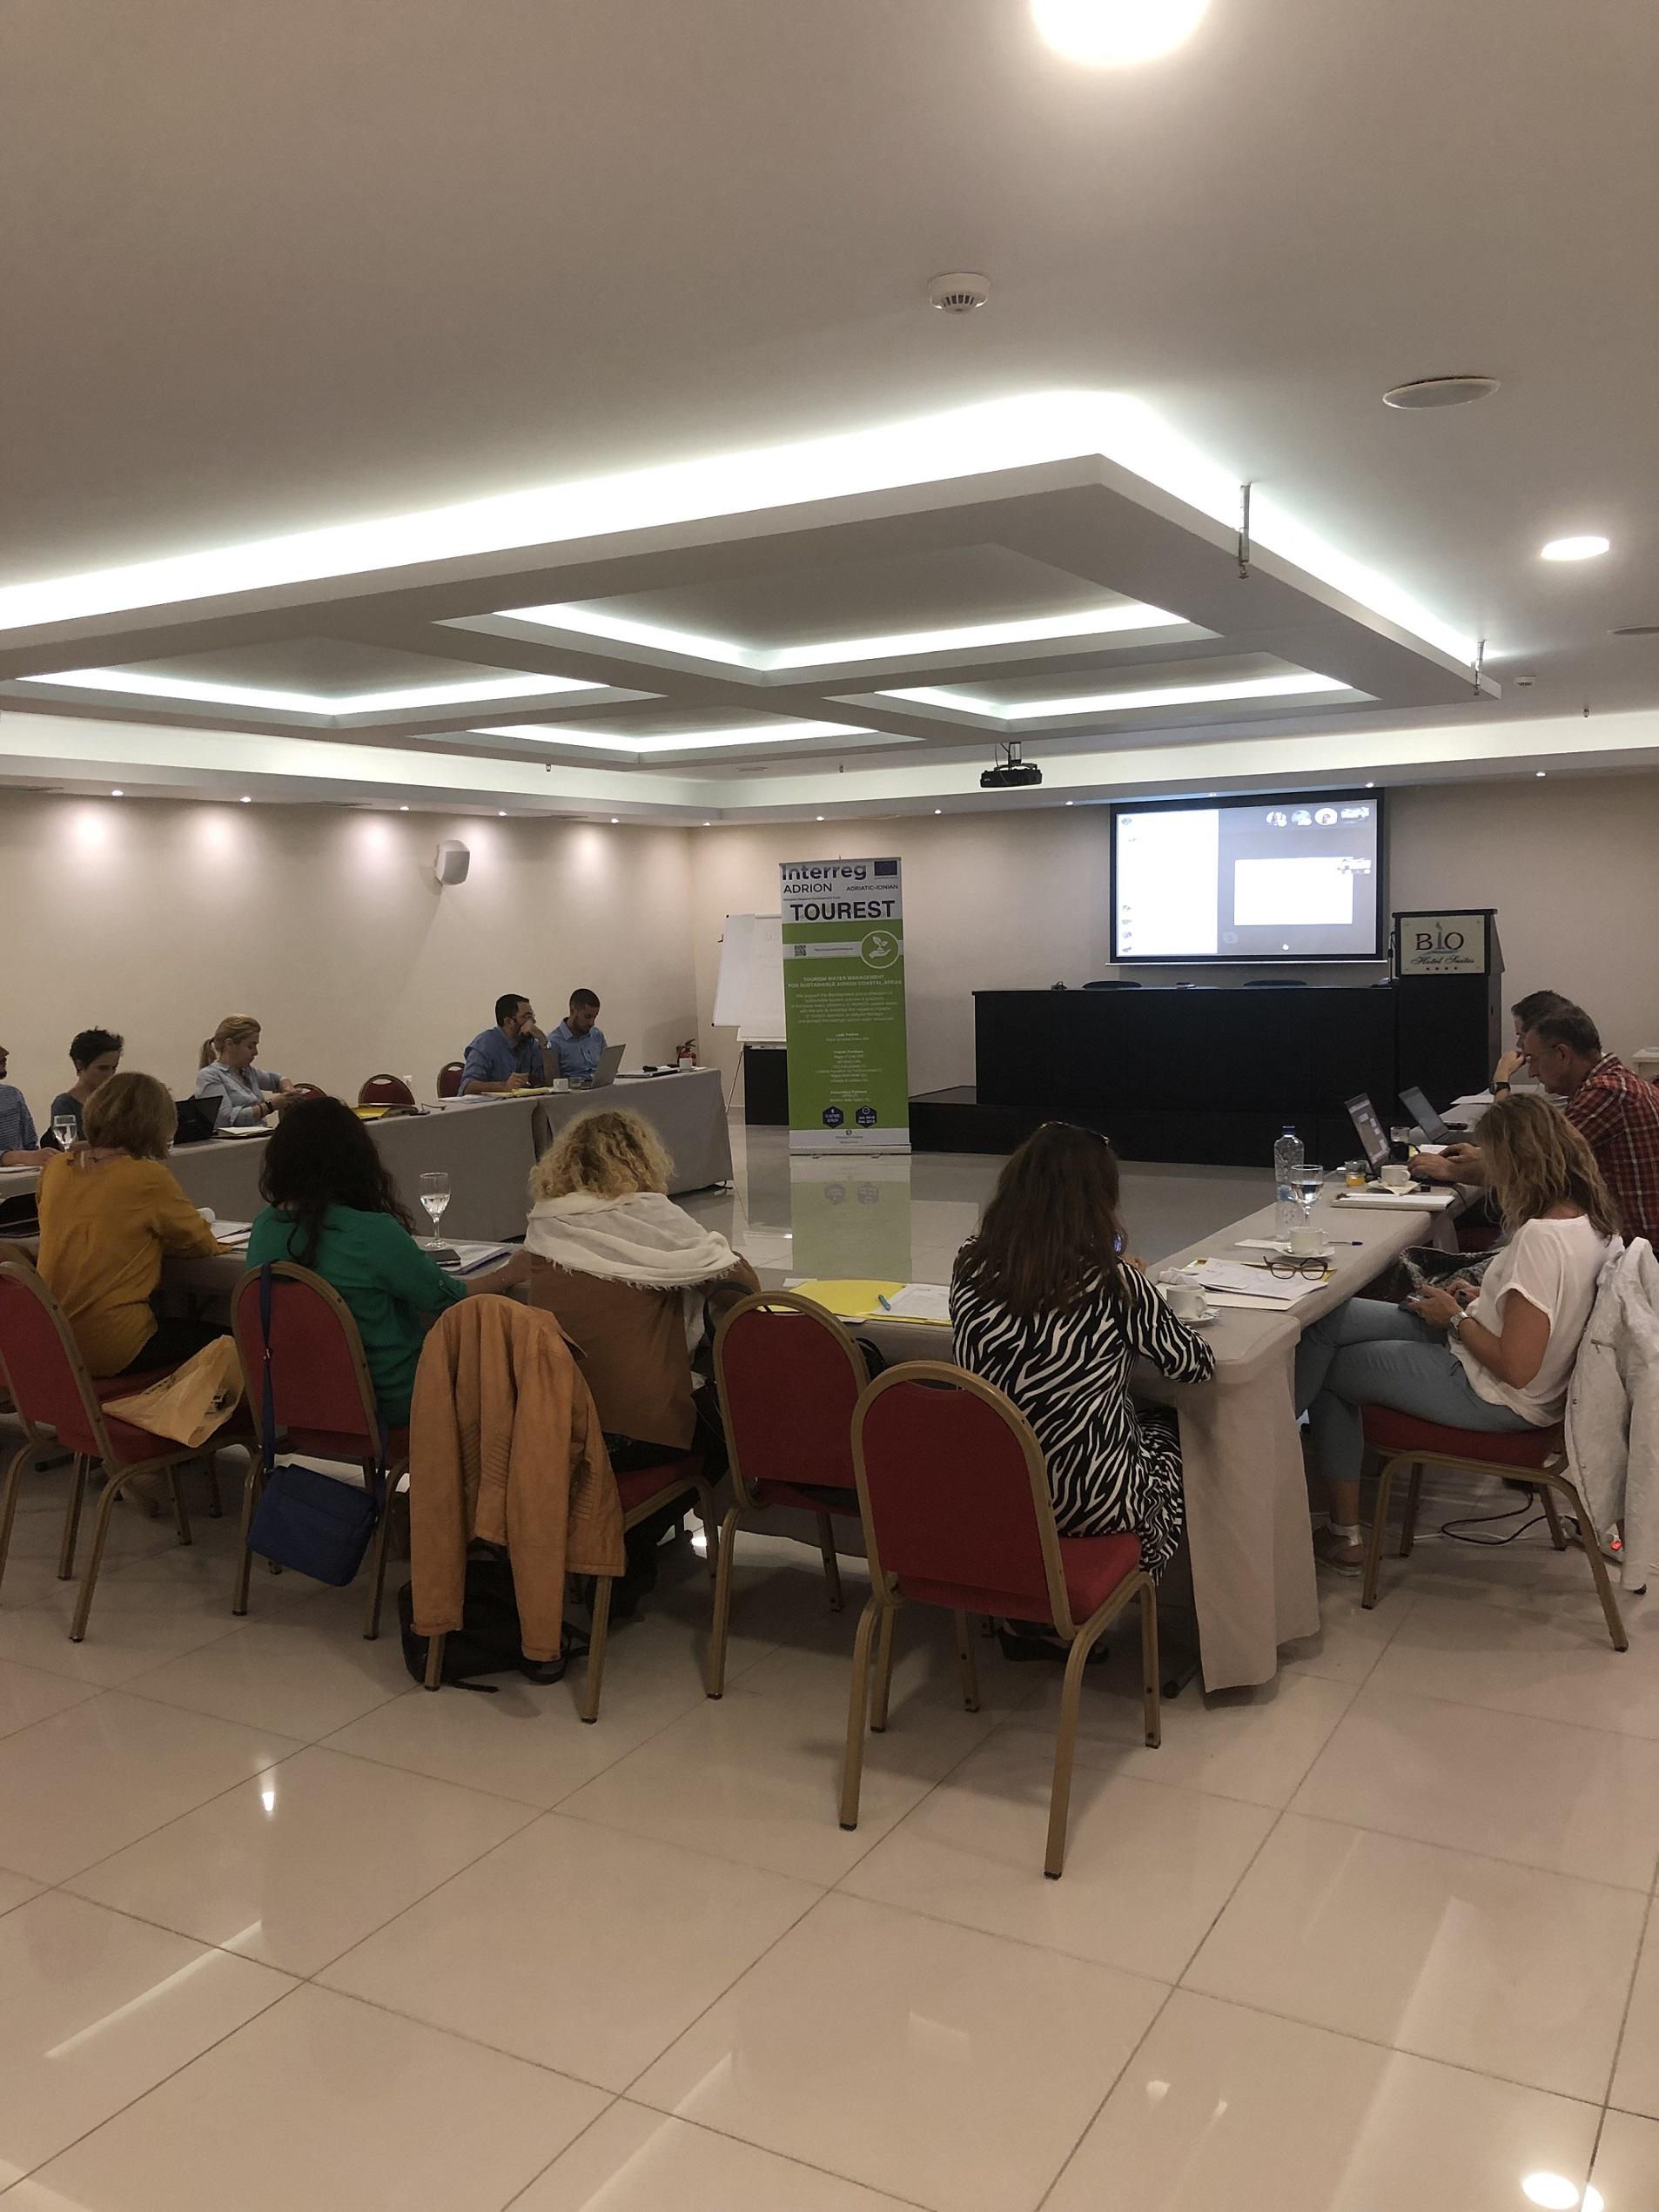 Projektni sestanek Interreg Adrion projekta Tourest